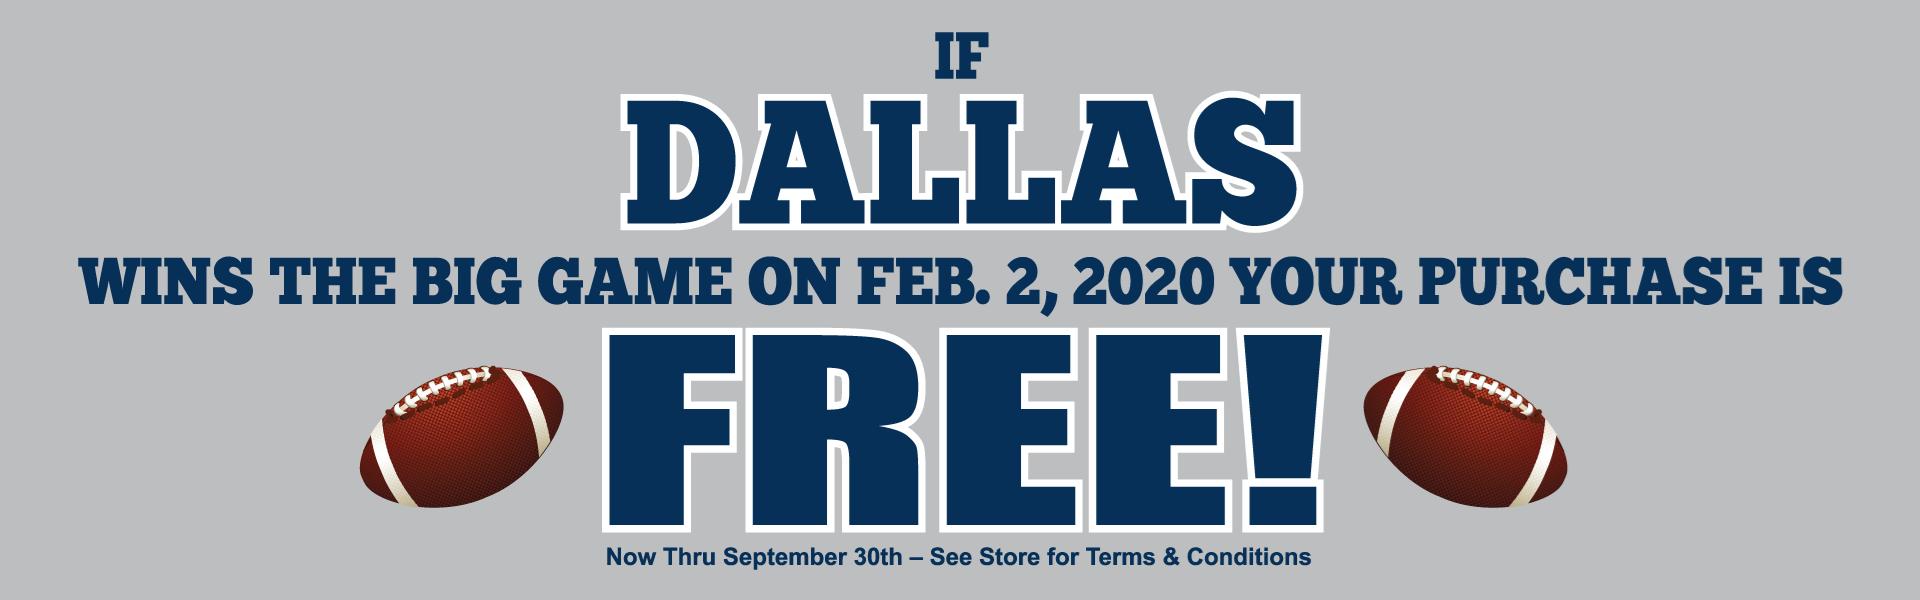 Dallas Cowboys Win Super Bowl